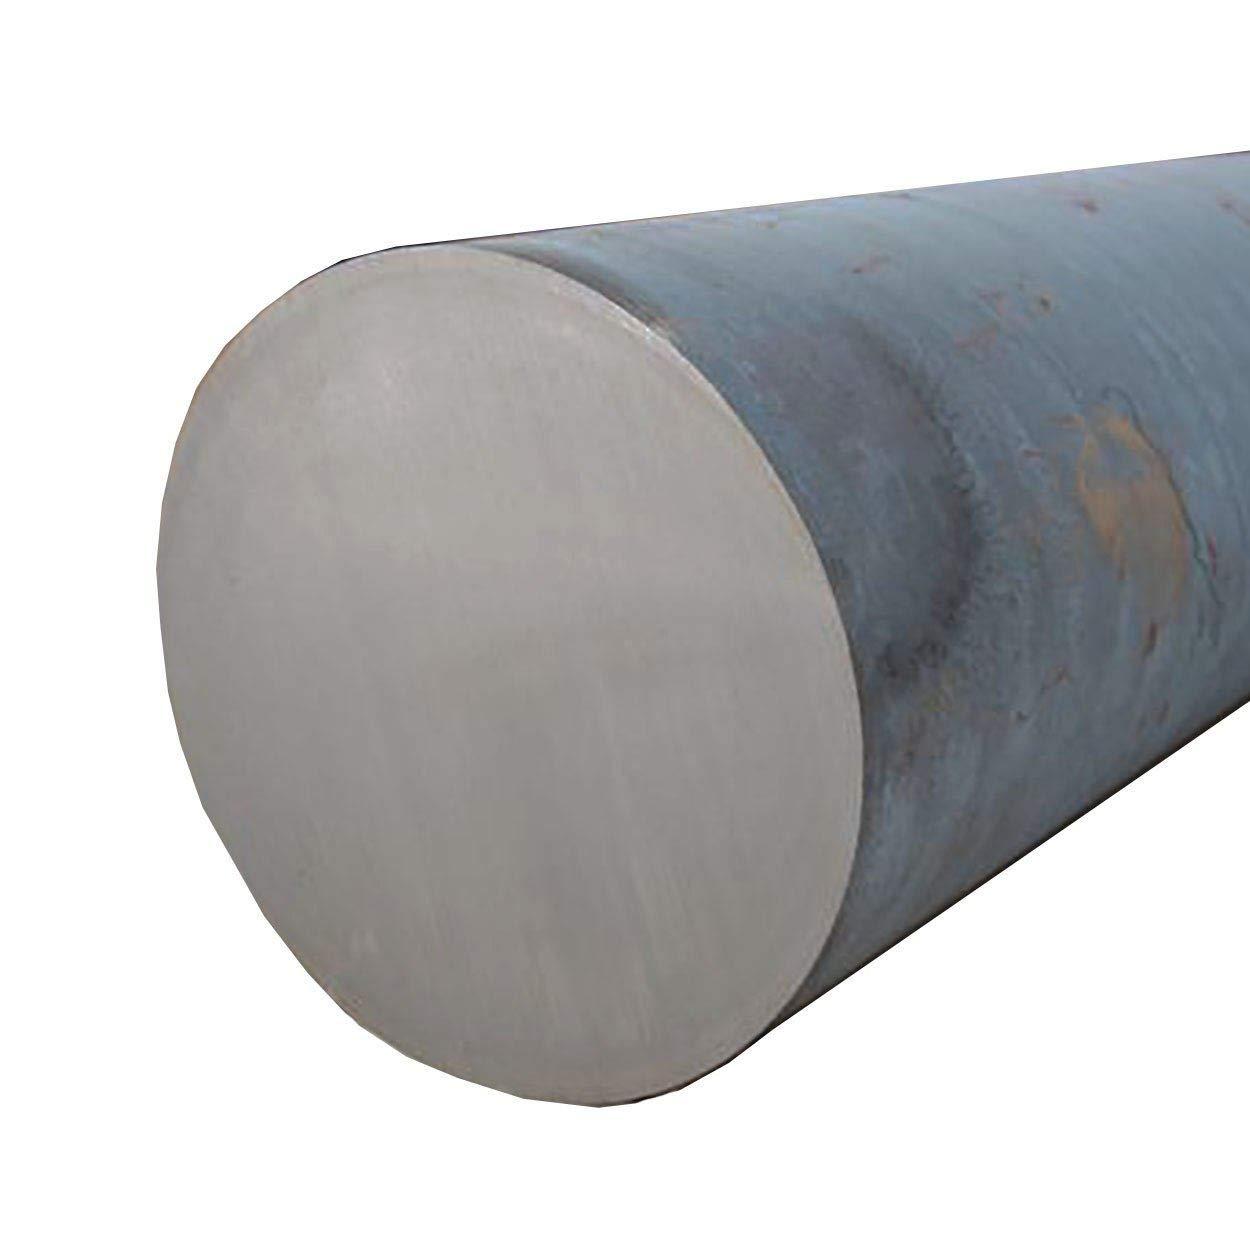 Online Metal Supply 65-45-12 Ductile Iron Round Bar, 6.000 (6 inch) x 6 inches by Online Metal Supply